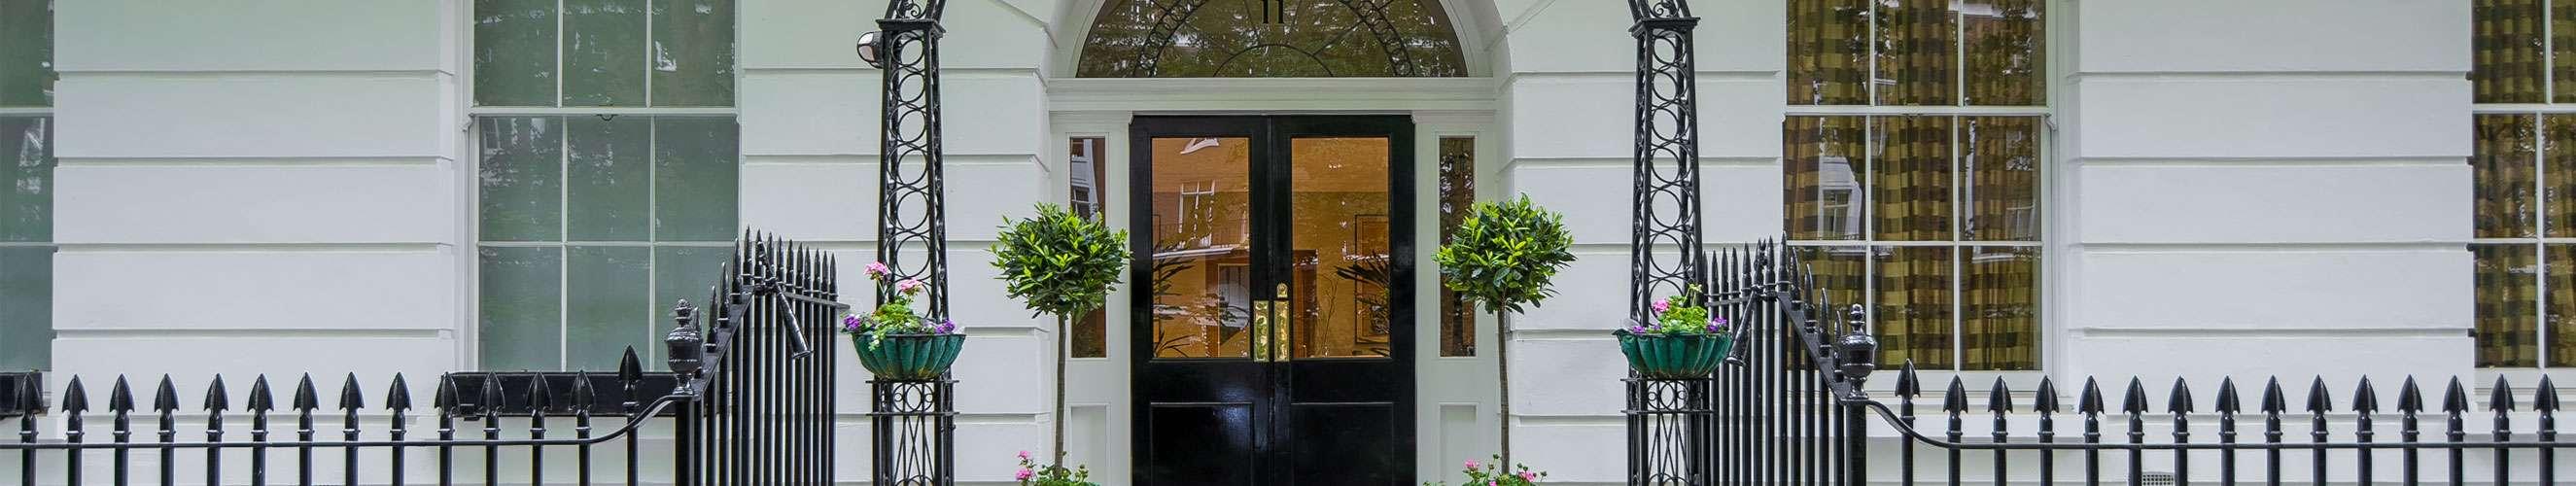 Marylebone interiors